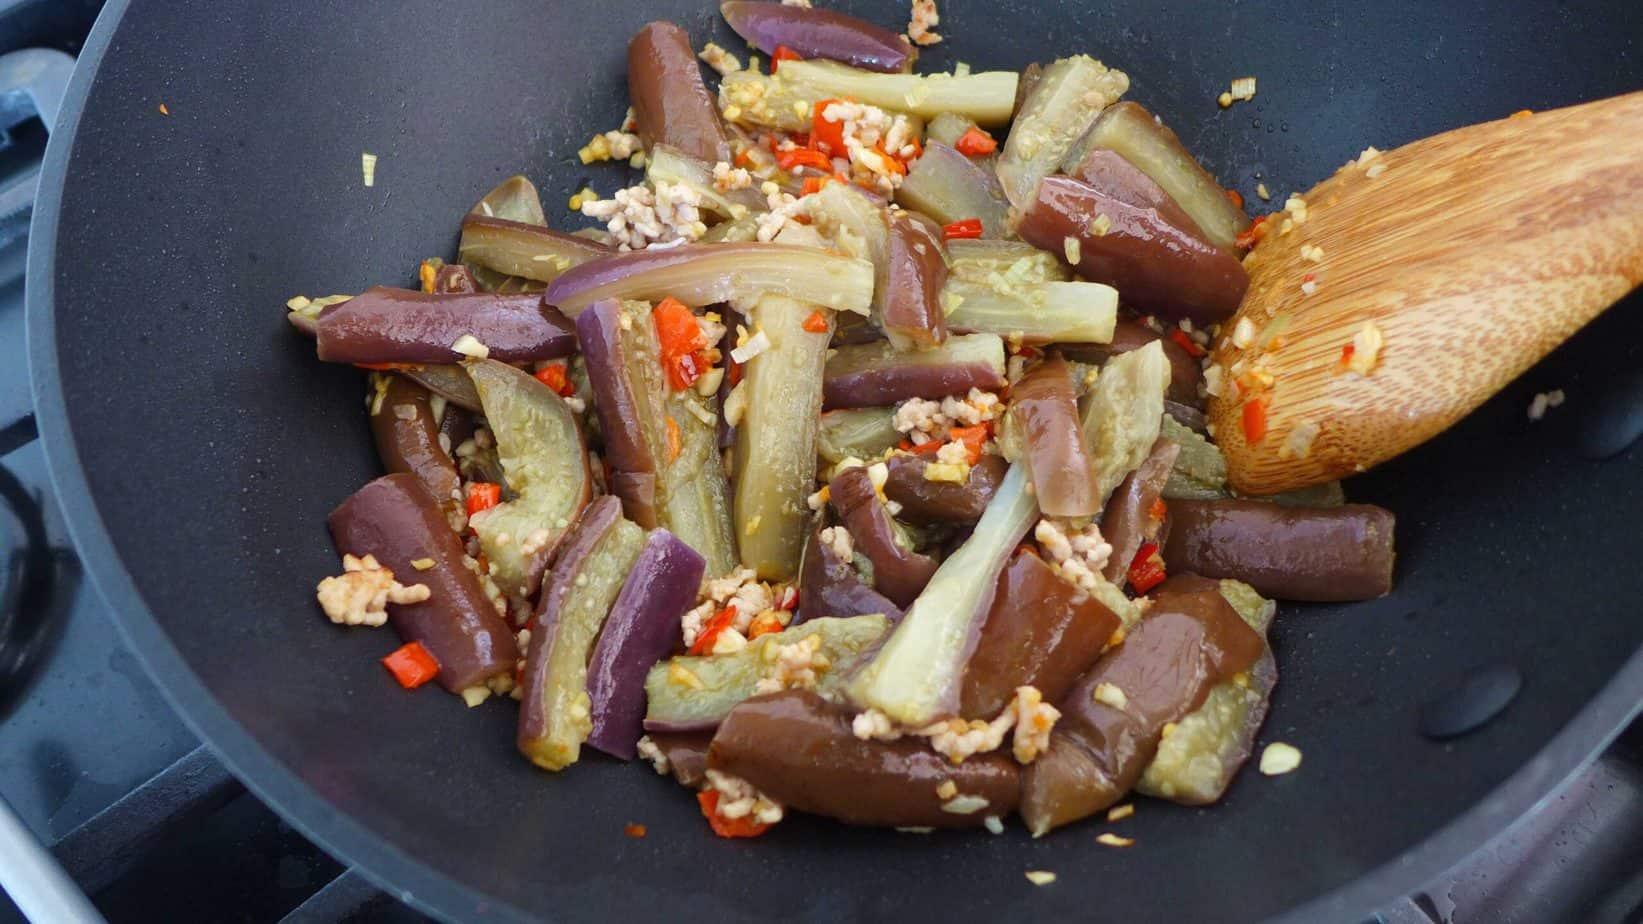 Stir-frying eggplant